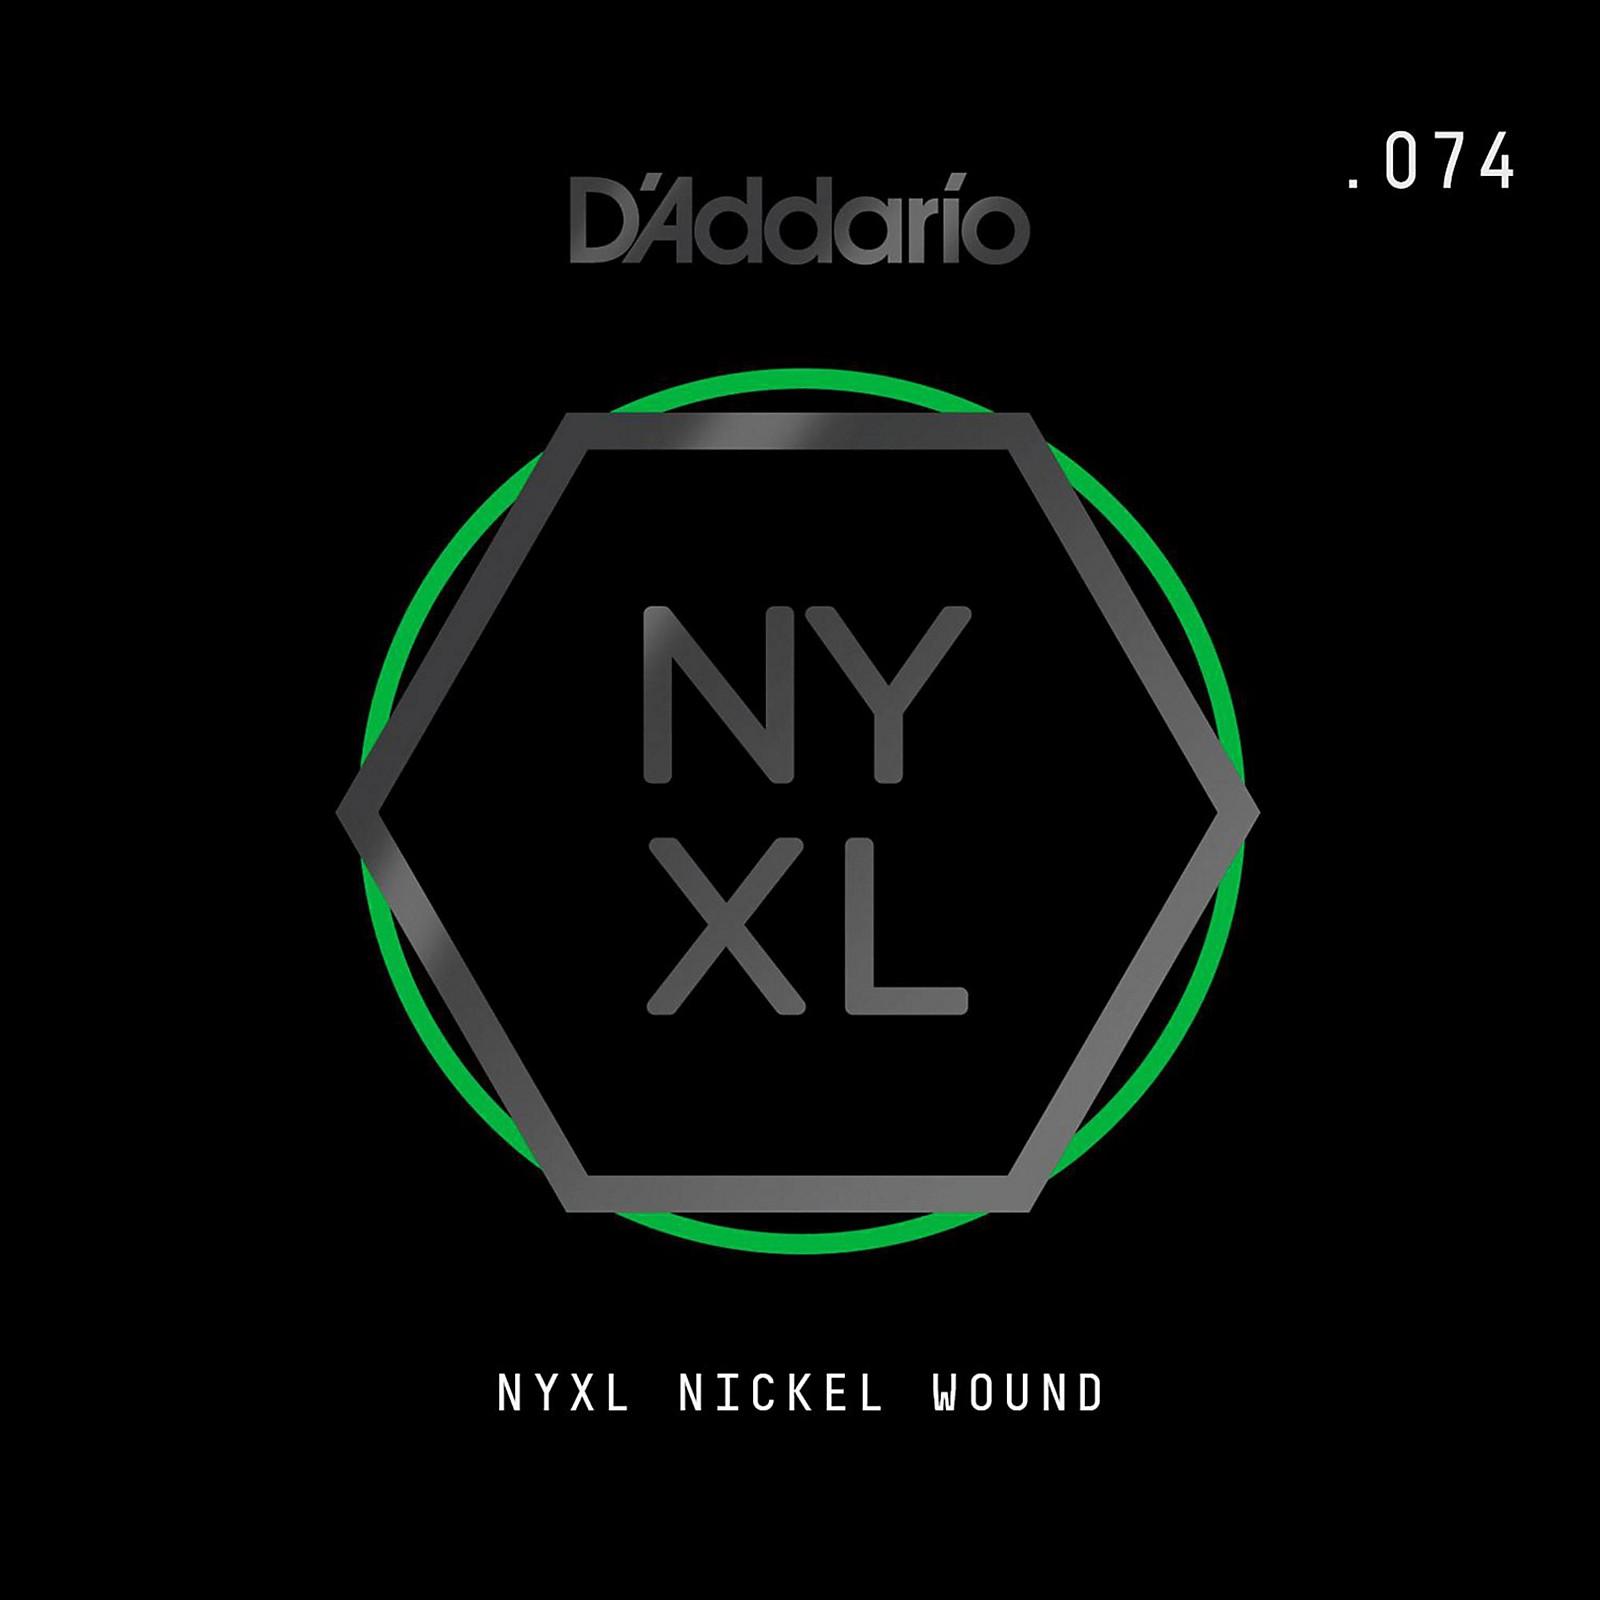 D'Addario NYNW074 NYXL Nickel Wound Electric Guitar Single String, .074